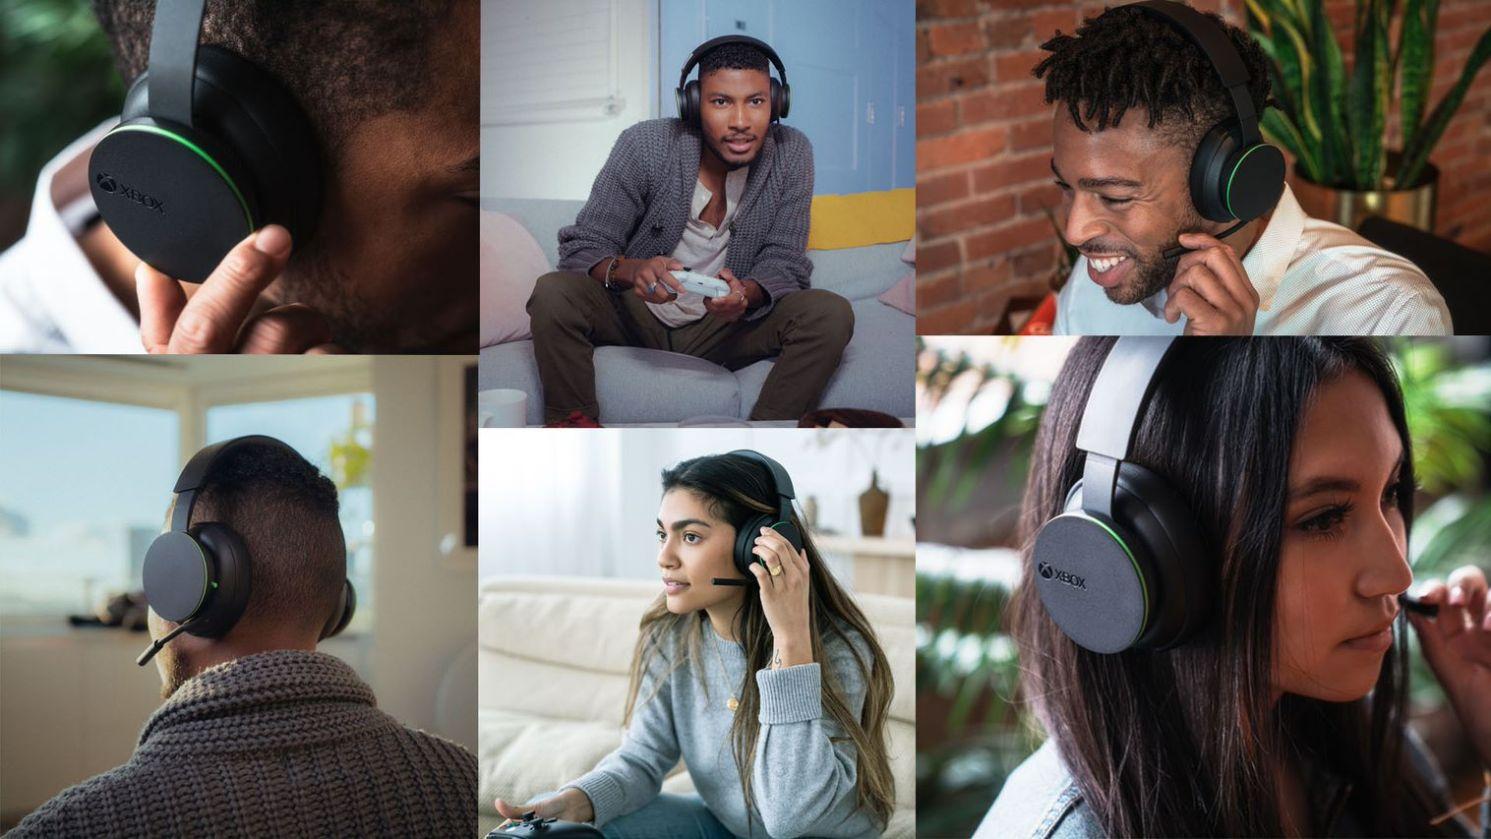 Xbox Wireless Headset Anuncio